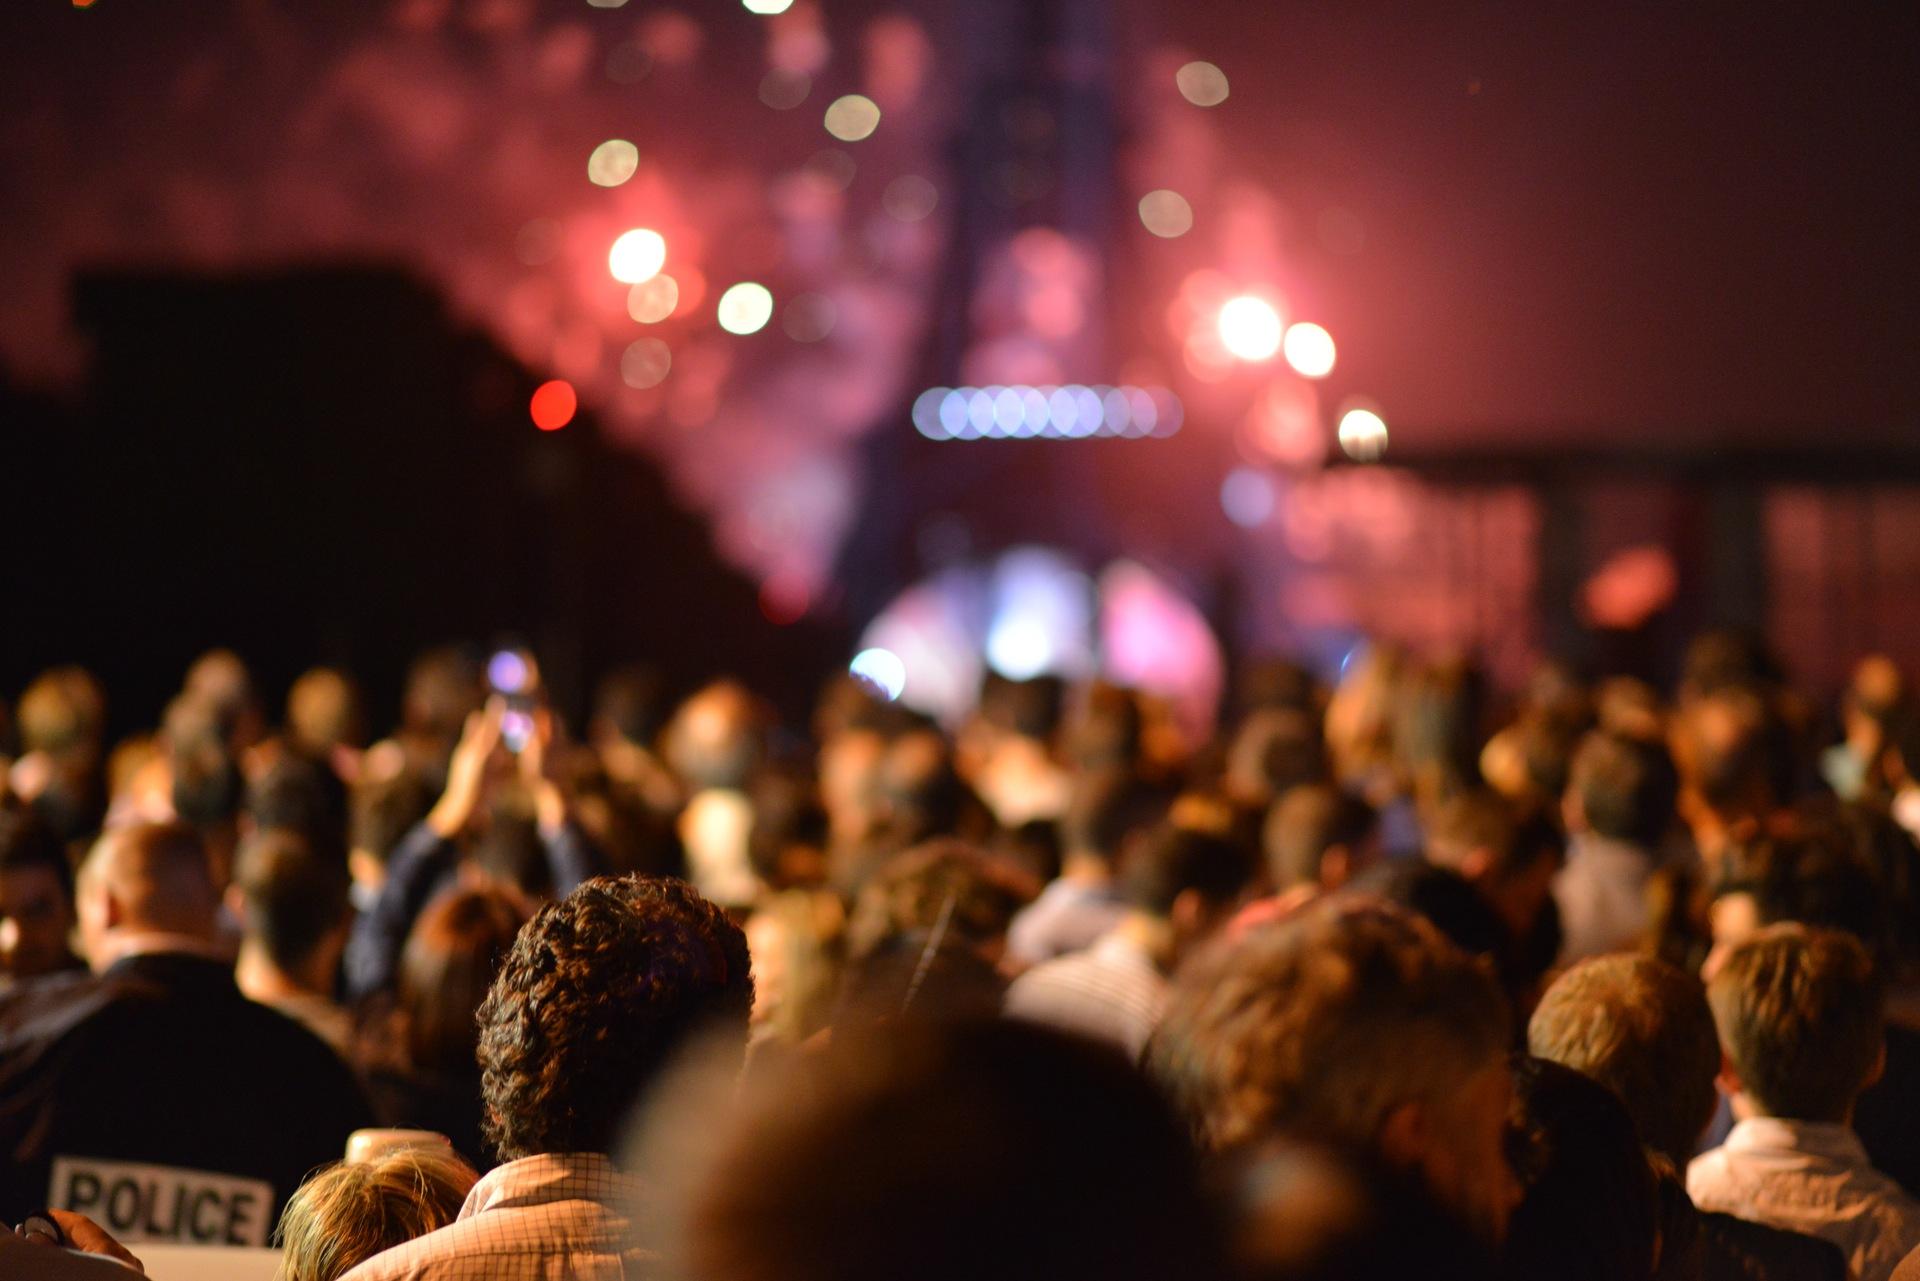 Grayling z europejską nagrodą Nagrody people eiffel tower lights night